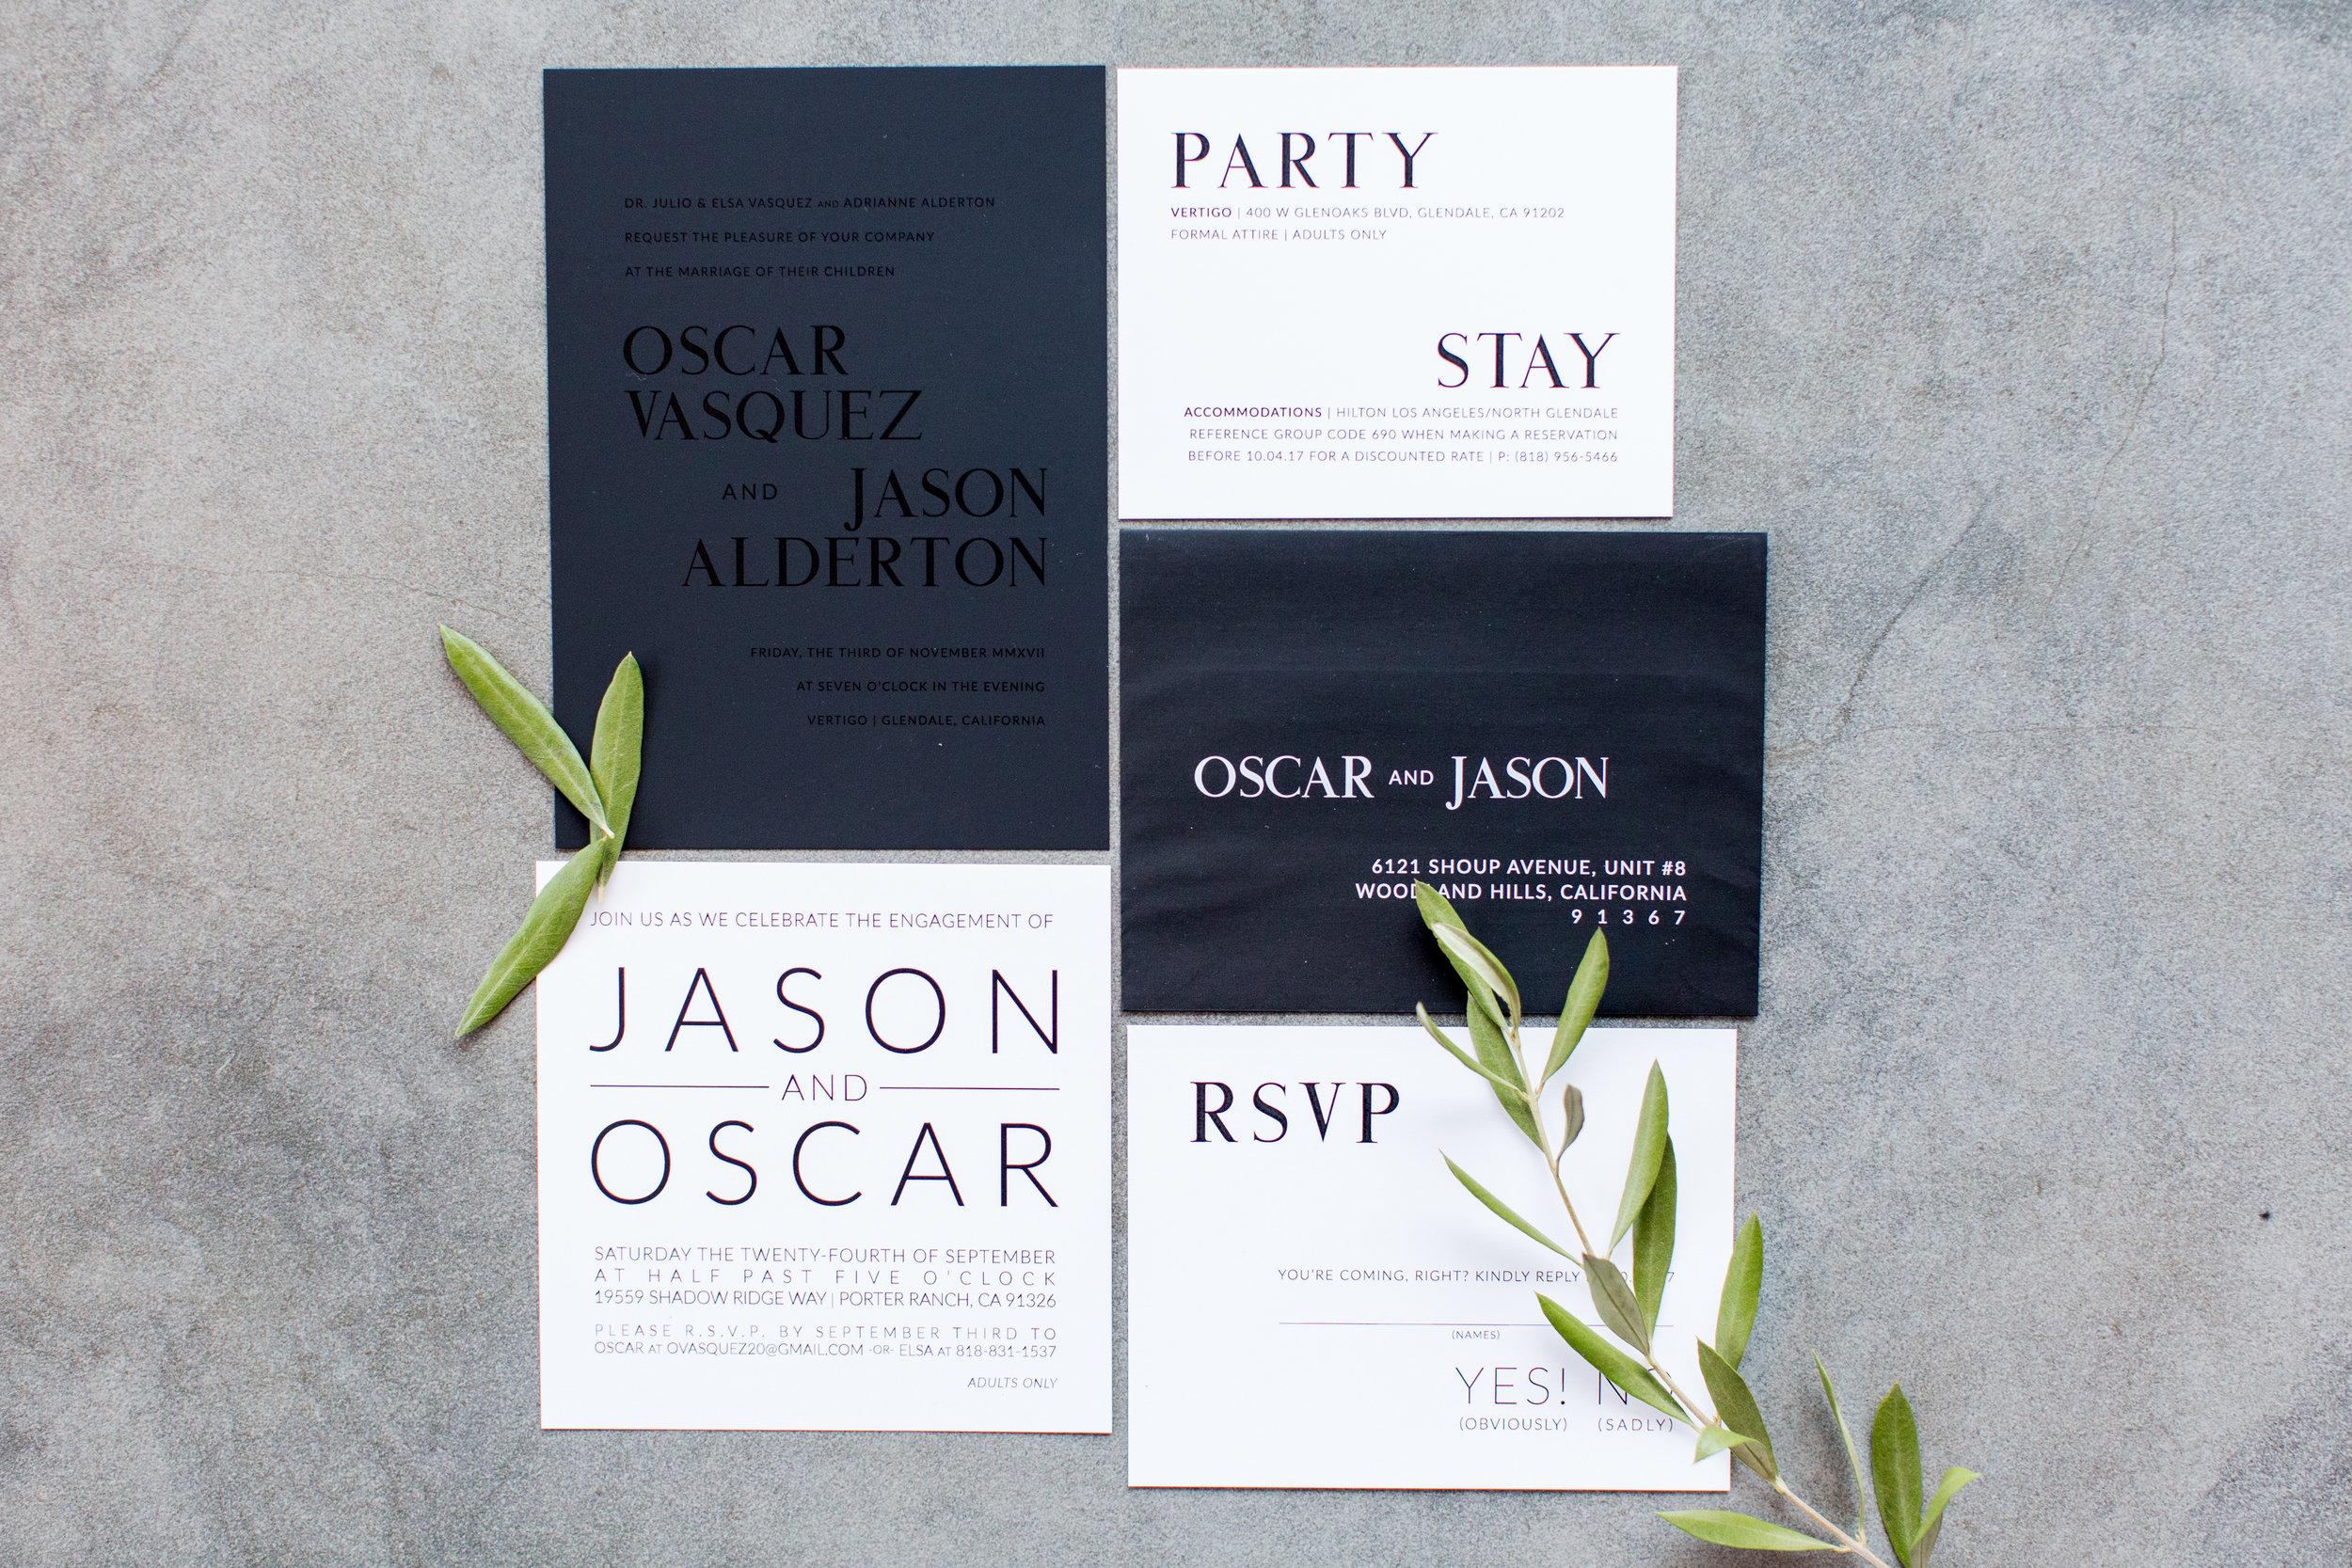 Oscar&Jason_Wedding11.03.17_MichelleKylePhotography-3.jpg